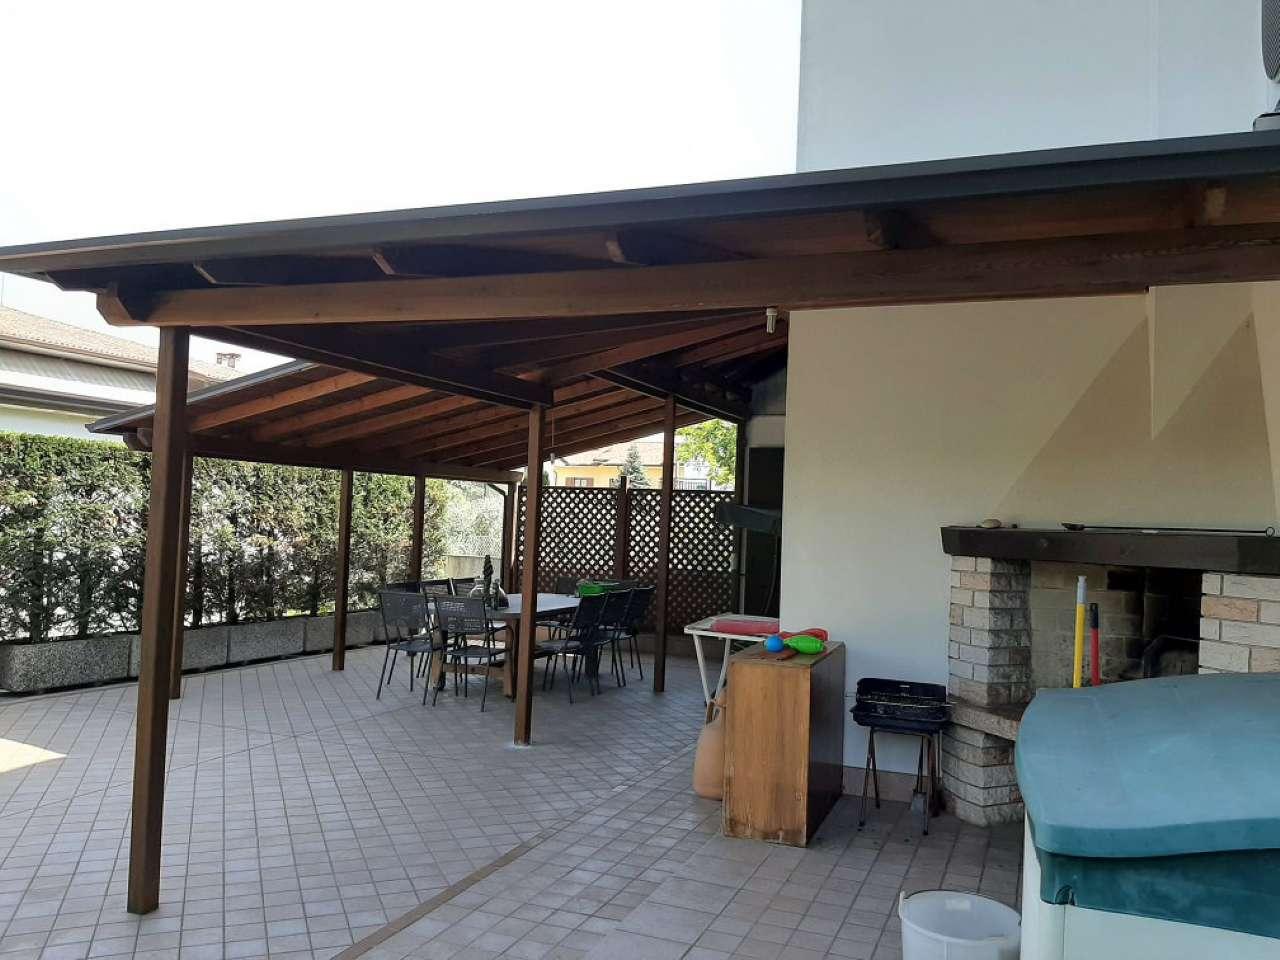 Bussolengo - Villa con giardino, foto 12